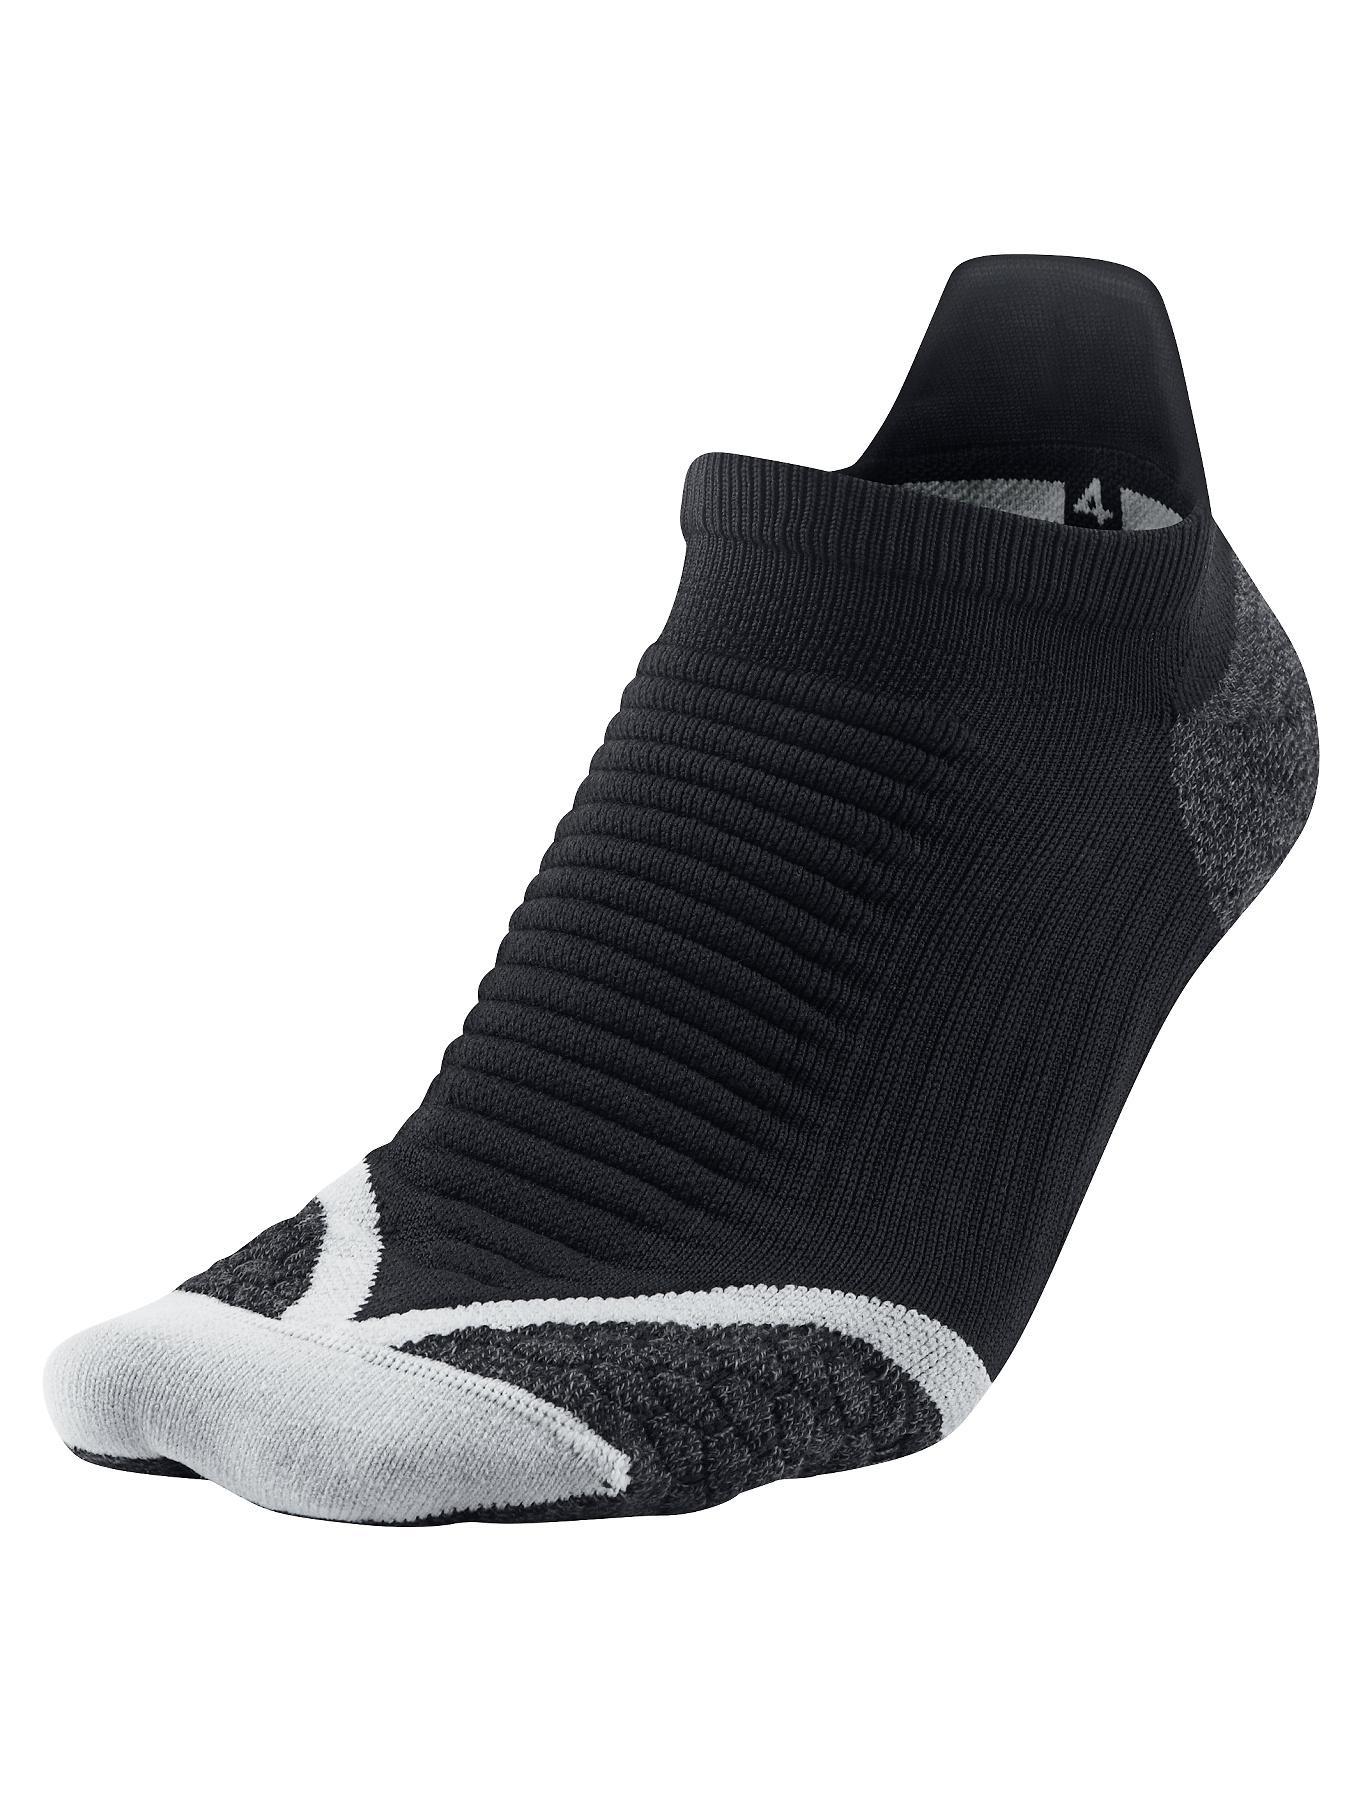 Elite Mens Cushioned Running Socks, Black at Littlewoods